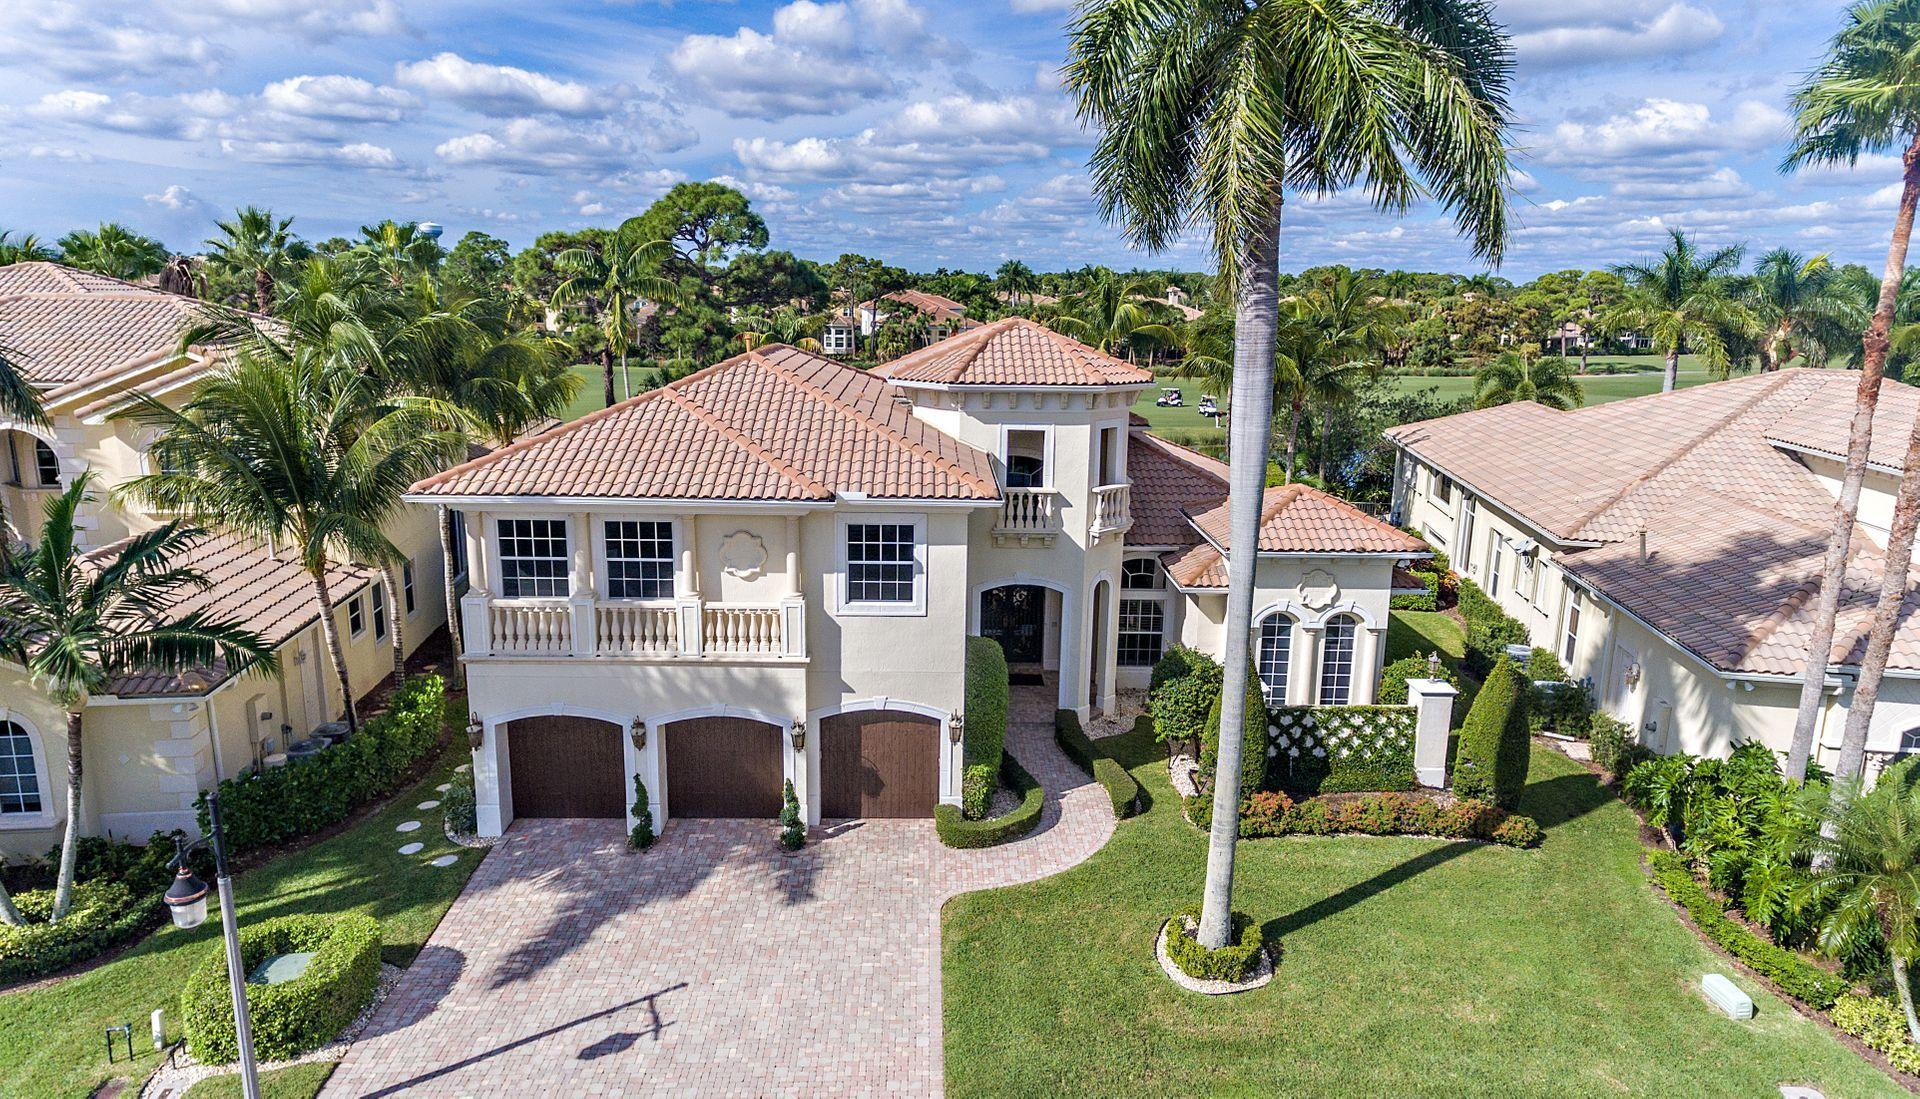 423 Savoie Drive, Palm Beach Gardens, Florida 33410, 5 Bedrooms Bedrooms, ,5.2 BathroomsBathrooms,A,Single family,Savoie,RX-10486442